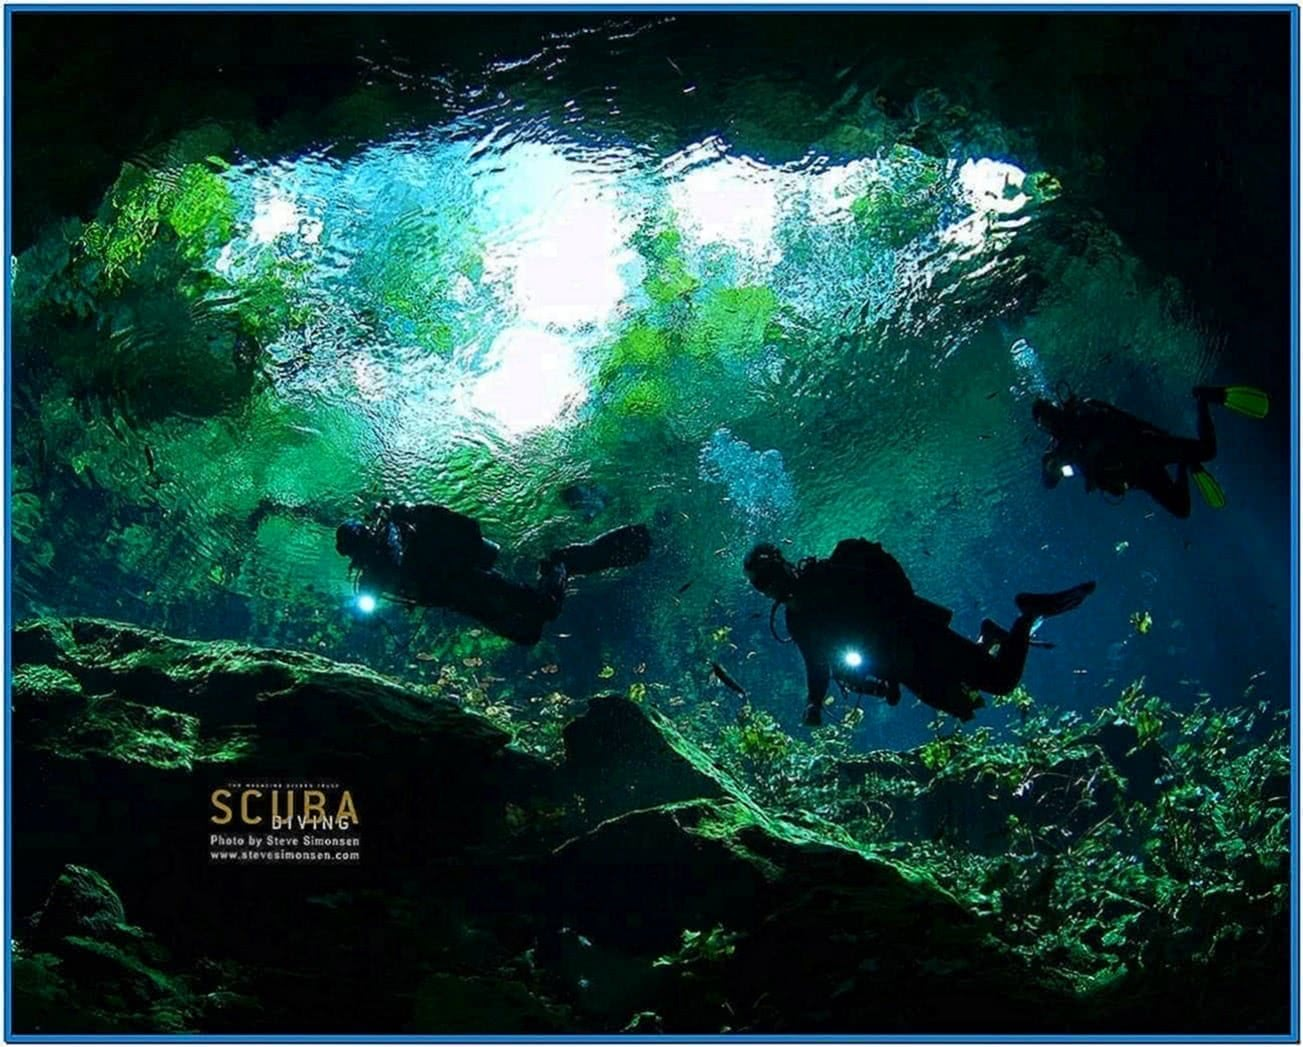 Riviera Maya Screensaver